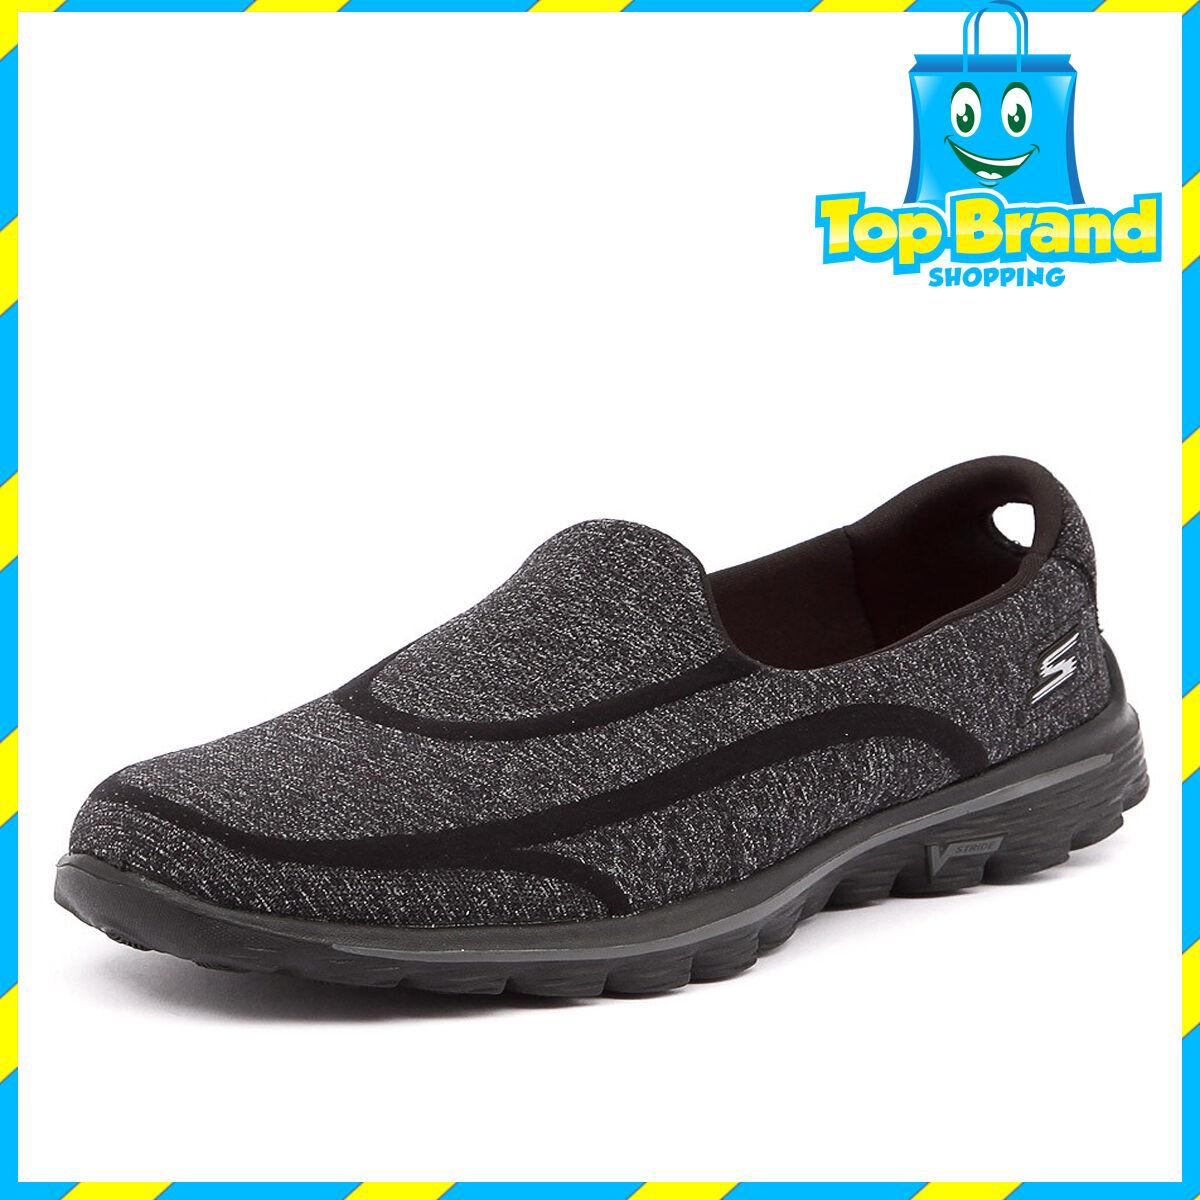 BRAND NEW - Skechers 13947 Go Walk femmes Casuals slip on chaussures - ALL TailleS BBK